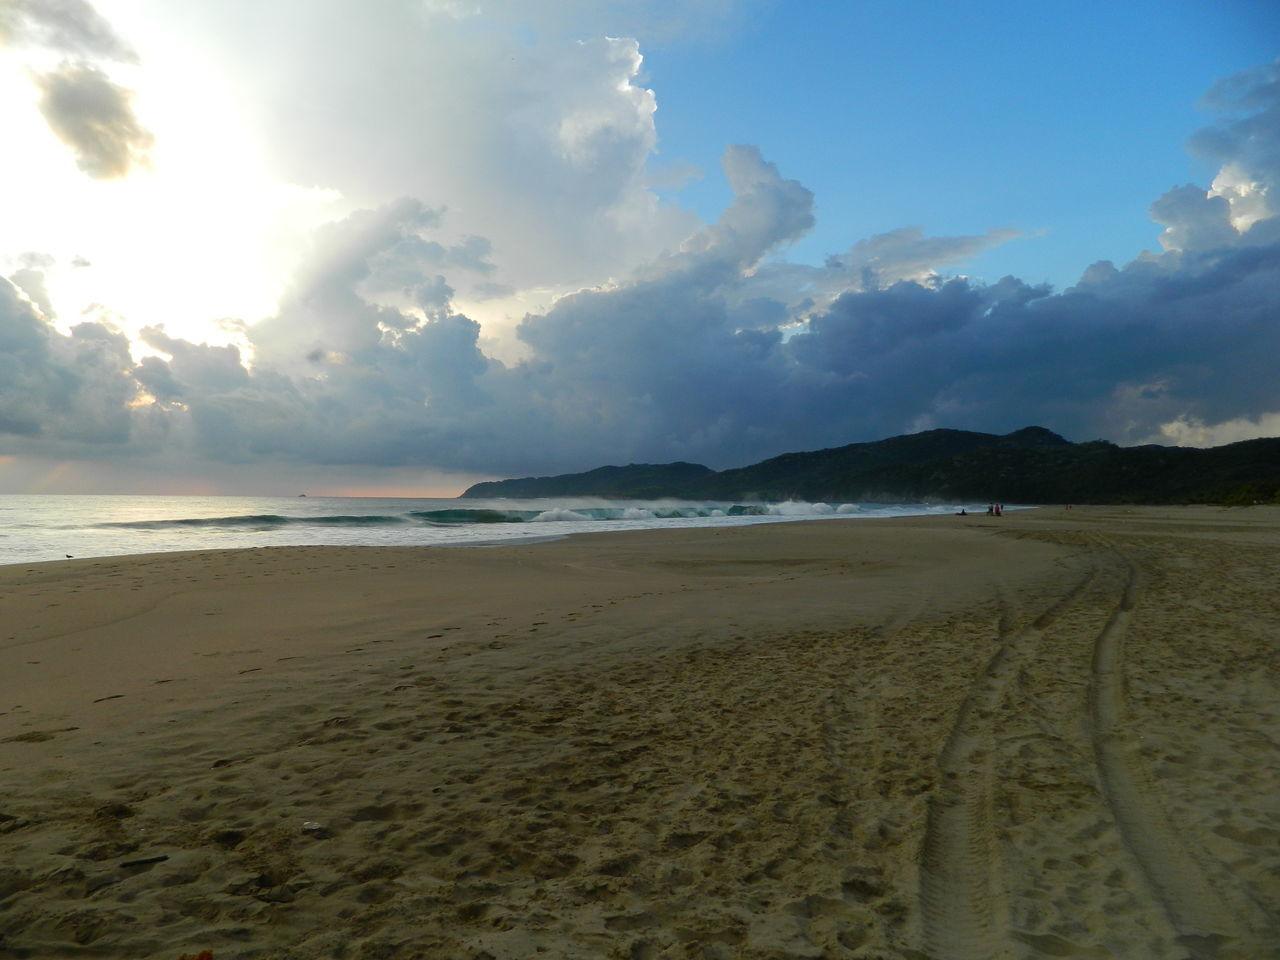 Playa Larga, Zihuatanejo Guerrero, Mexico Beach Beauty In Nature Cloud - Sky Landscape Nature Plant Playa Larga Sand Scenics Sea Sky The Great Outdoors - 2017 EyeEm Awards Tranquil Scene Tranquility Water Zihuatanejo EyeEmNewHere